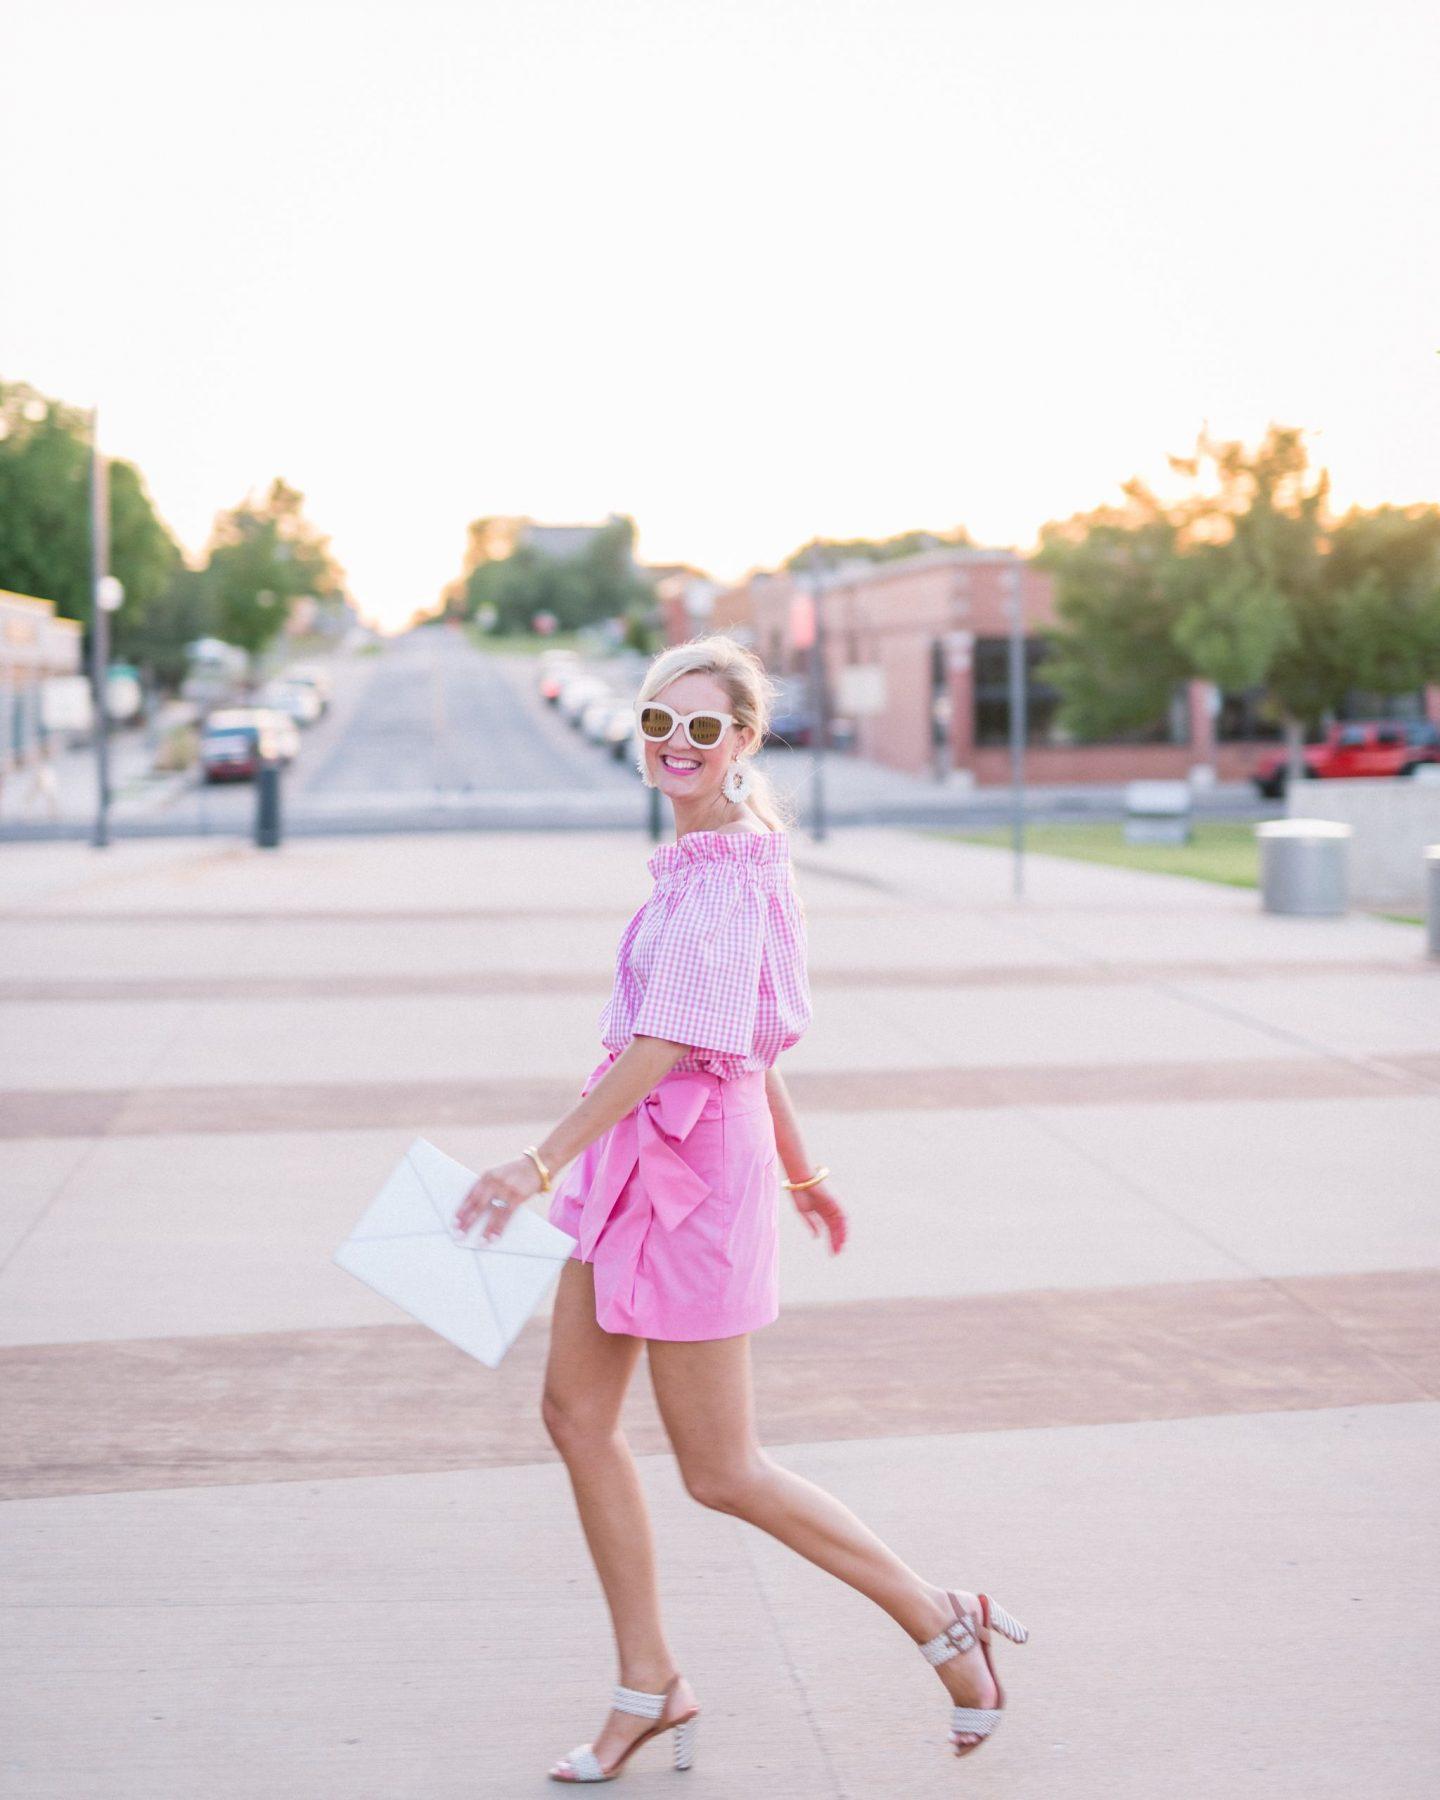 On Wednesdays, We Wear Pink!